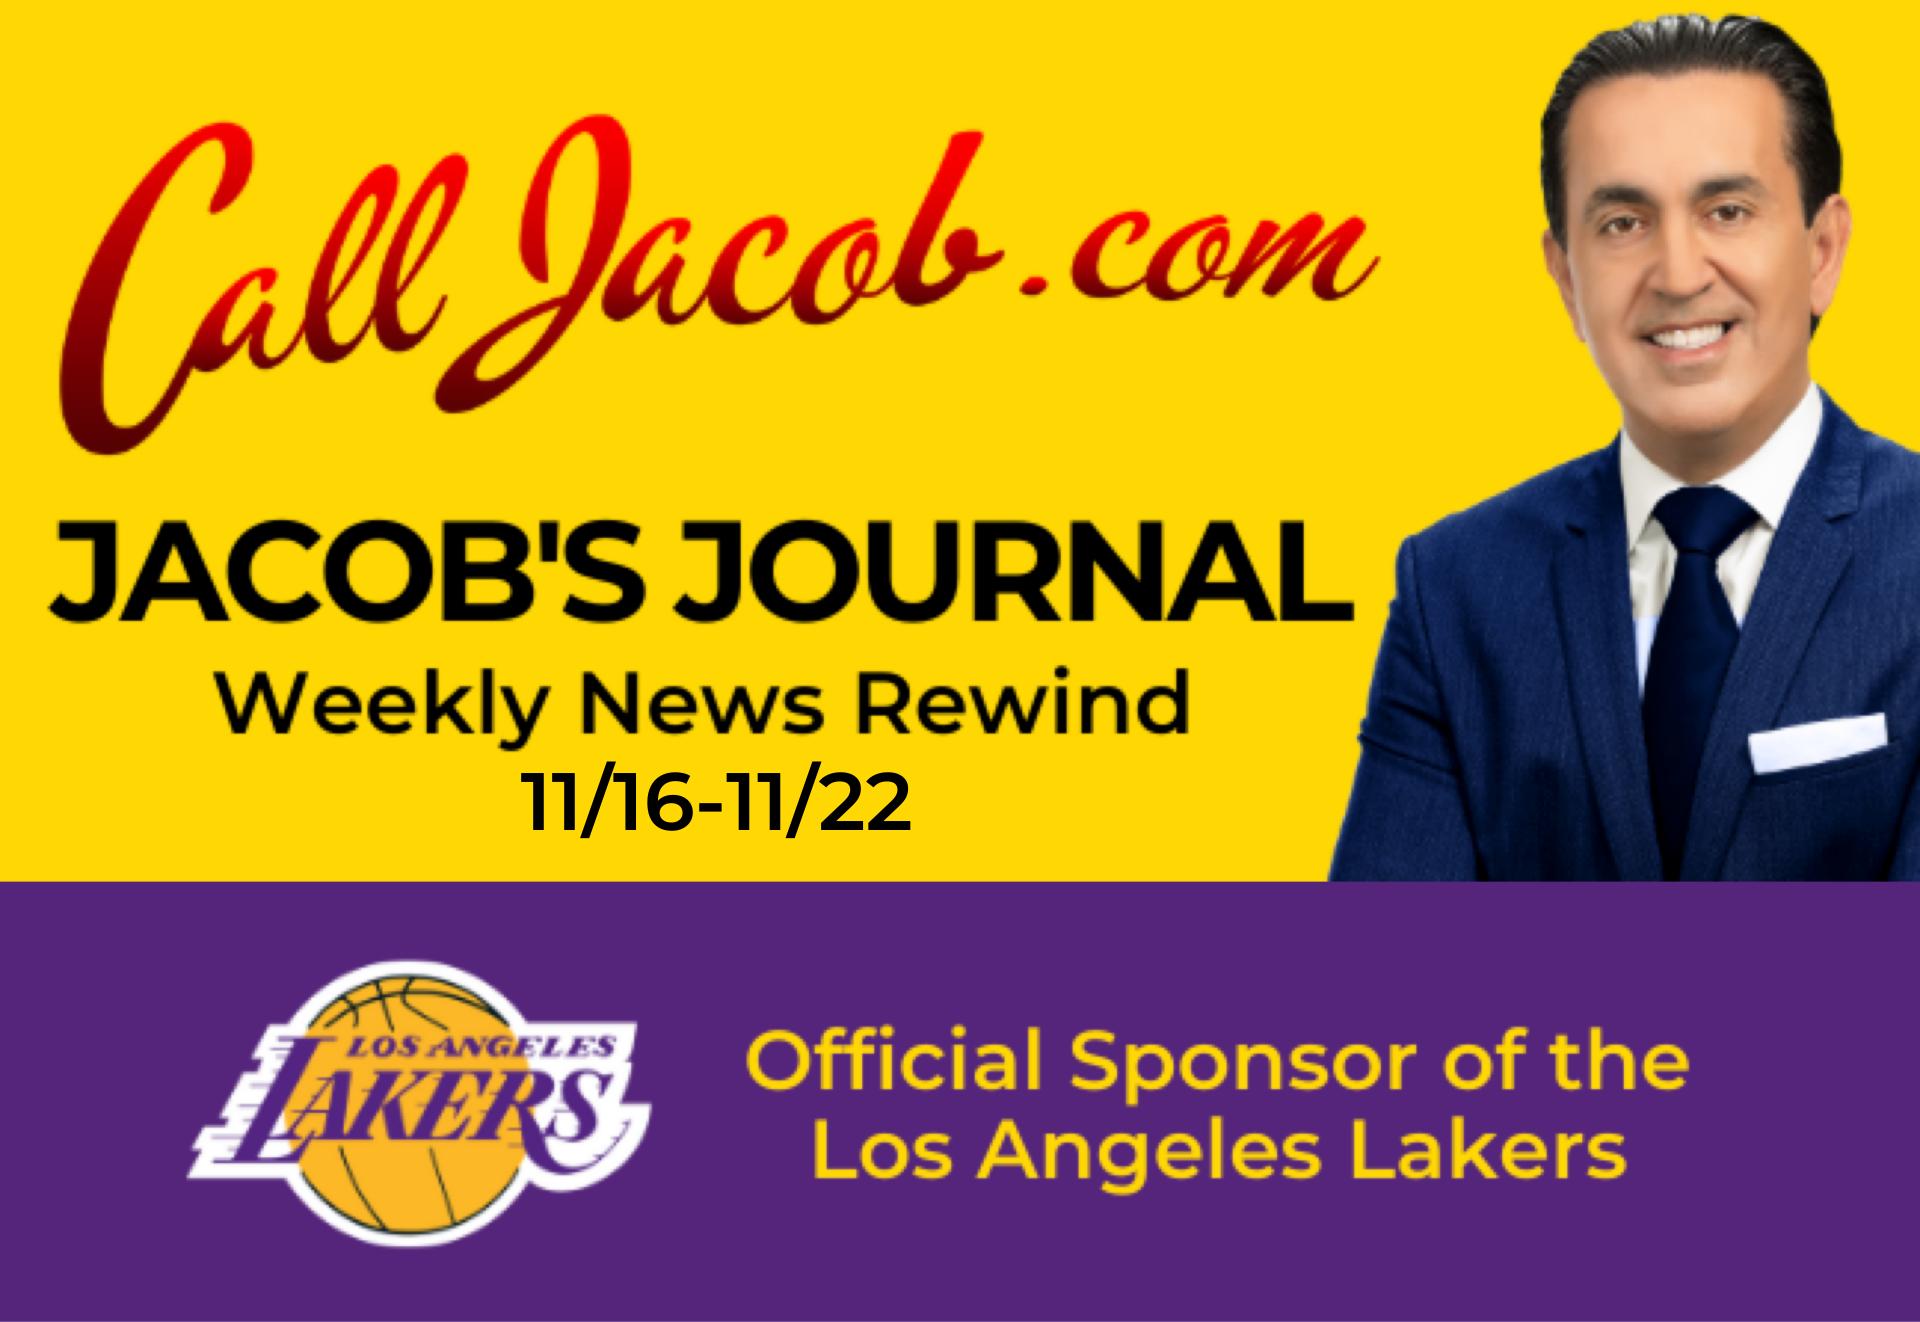 JacobsJournalWeeklyNewsRewind-11-16_11-22